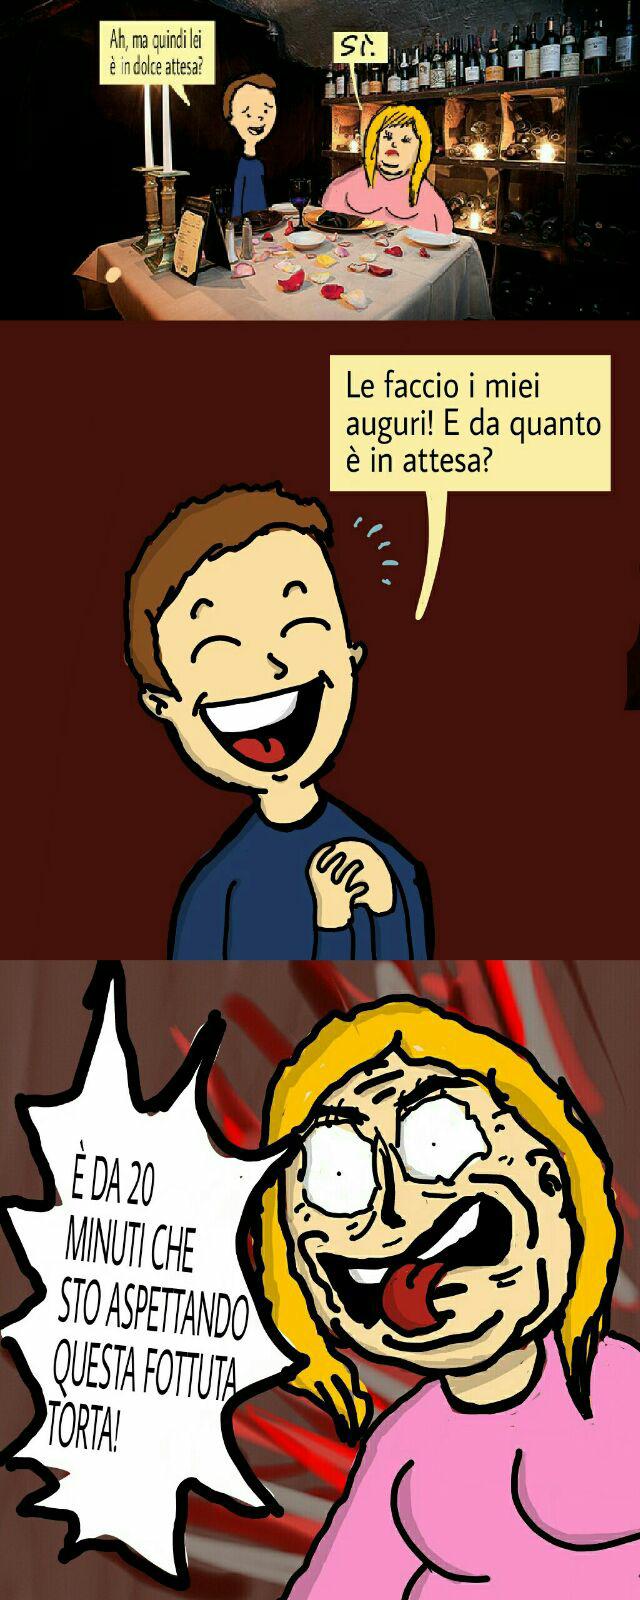 L'omino dei gelati pensa la donna sia incinta. Edit By Mortis - meme